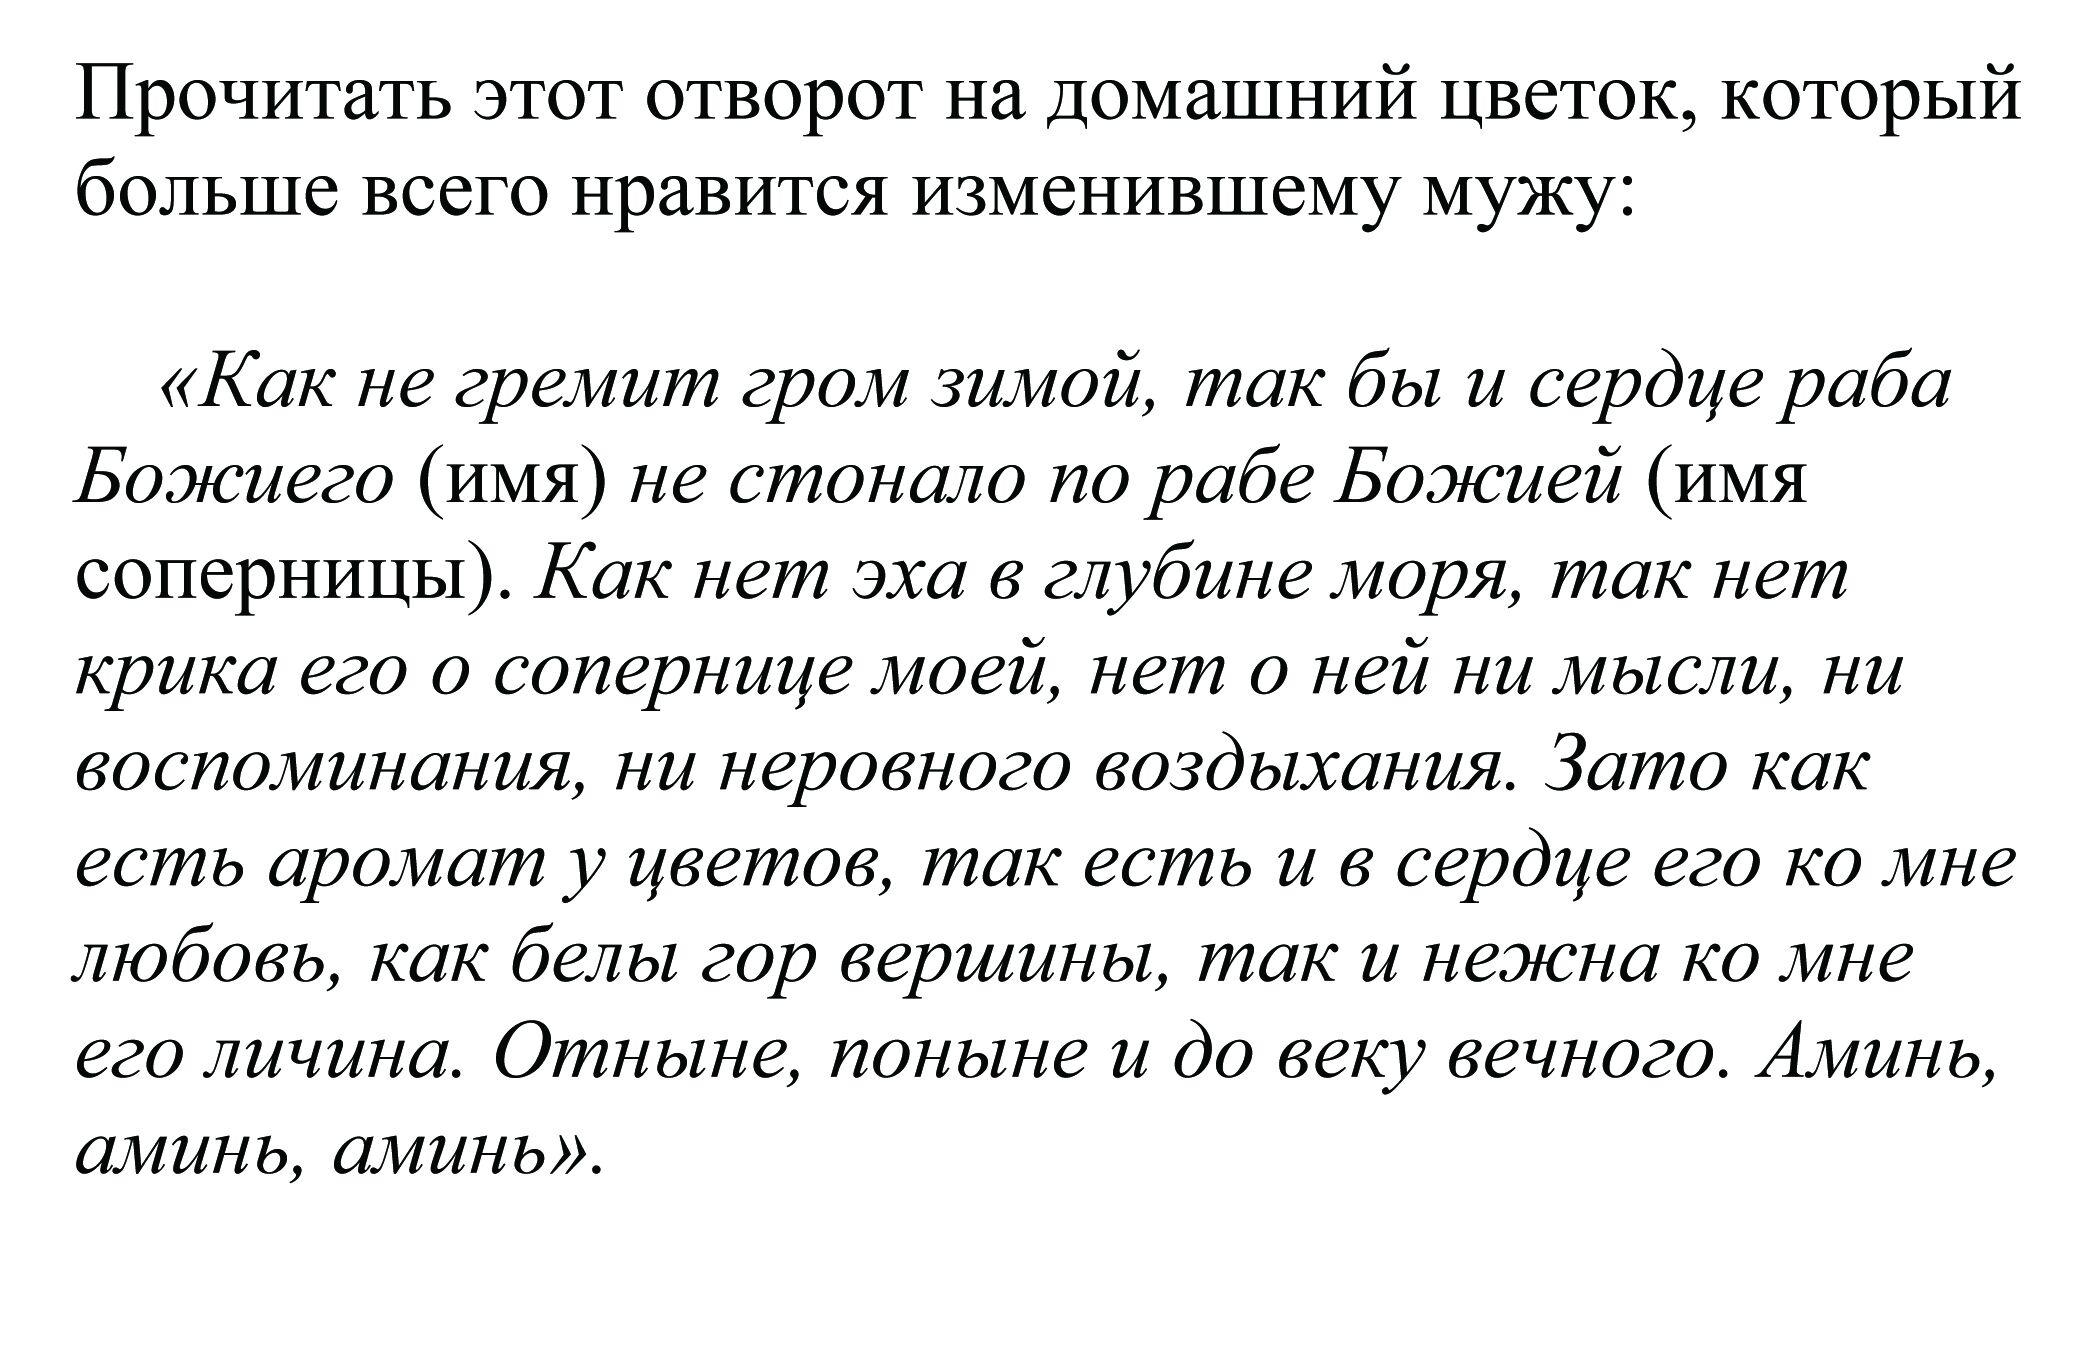 Lubovnitsa